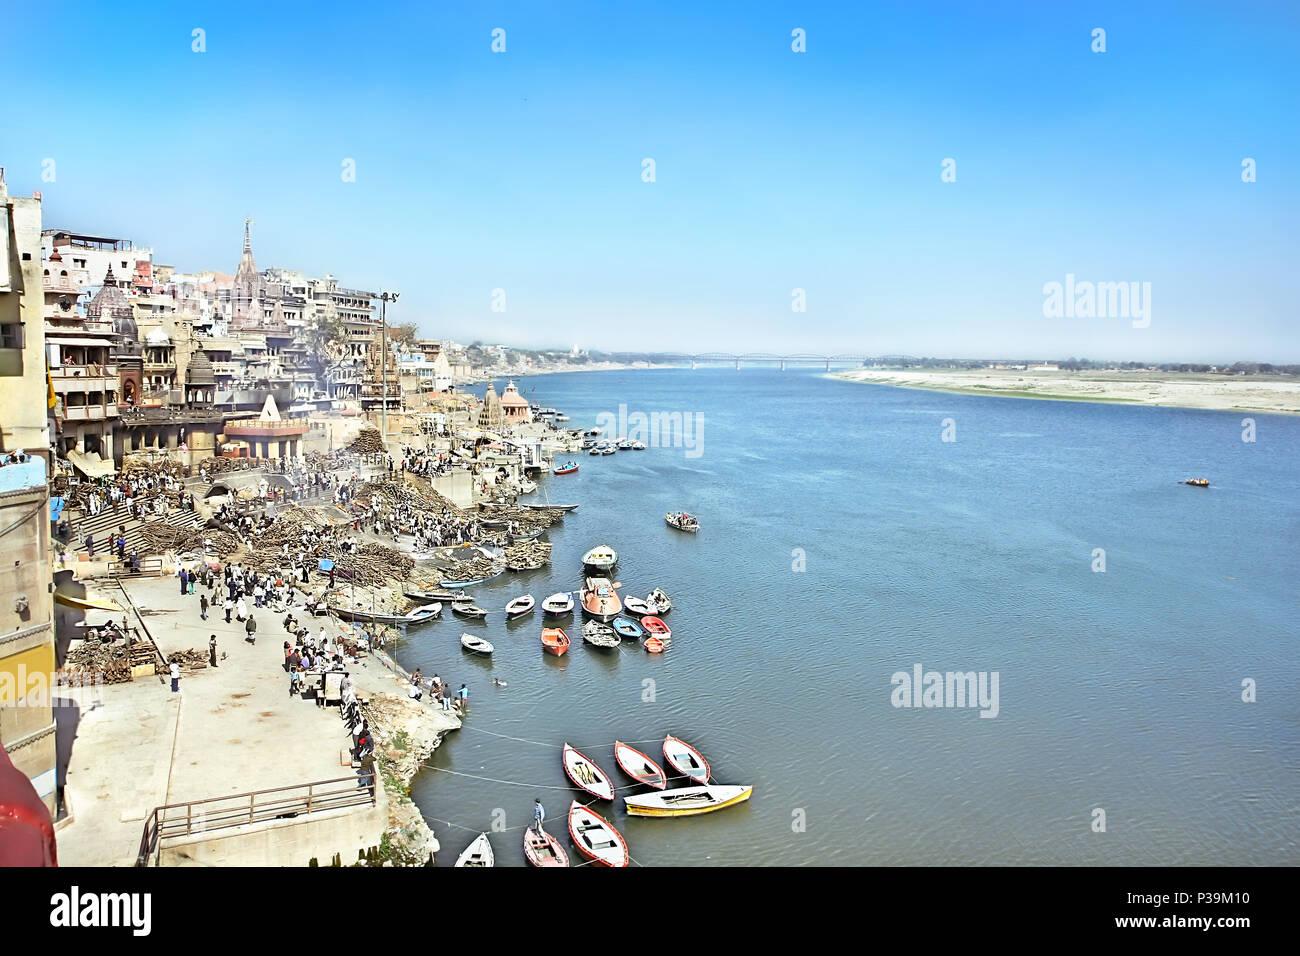 VARANASI, INDIA - 13 FEBRUARY: Cremation ghat , religious ceremony, on the banks of Ganga river, Prayag Ghat in holy Varanasi,  Uttar Pradesh, on  Feb - Stock Image